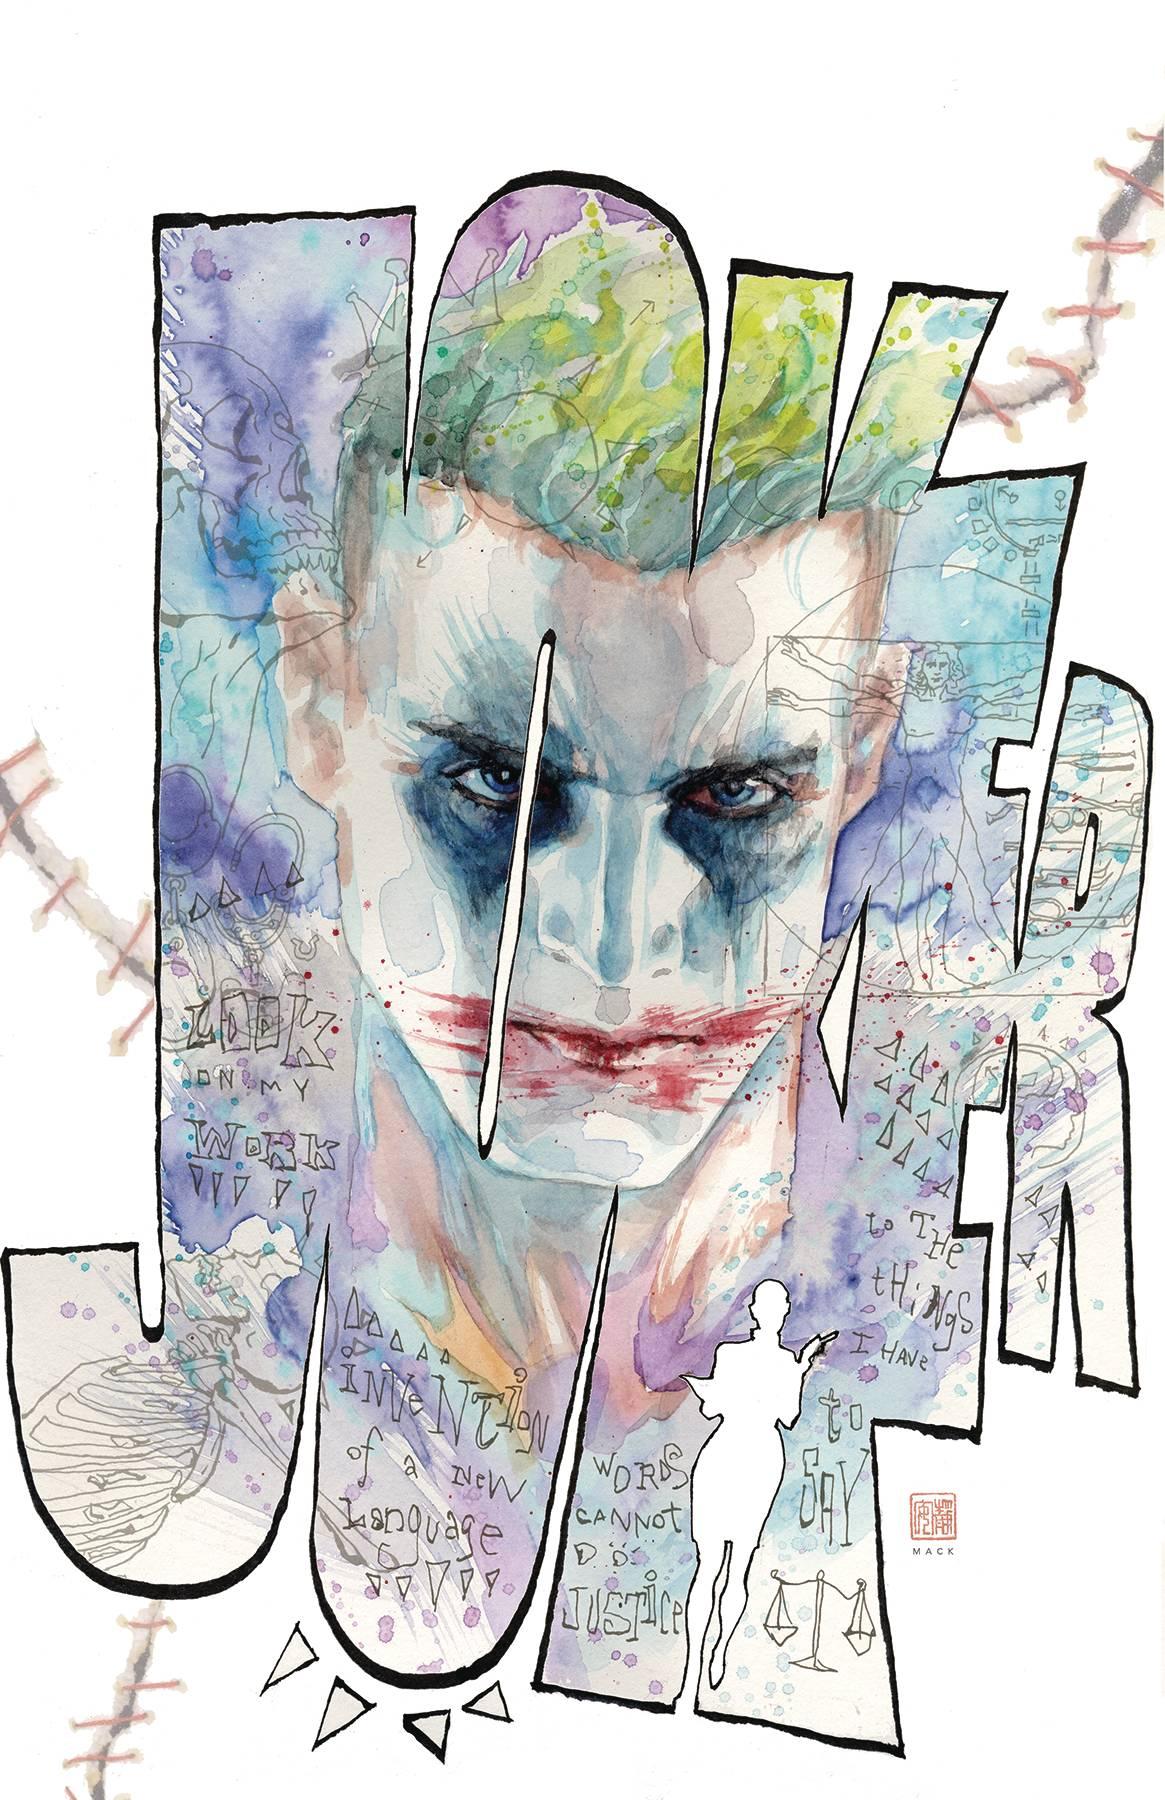 Joker / Harley Criminal Sanity Secret Files